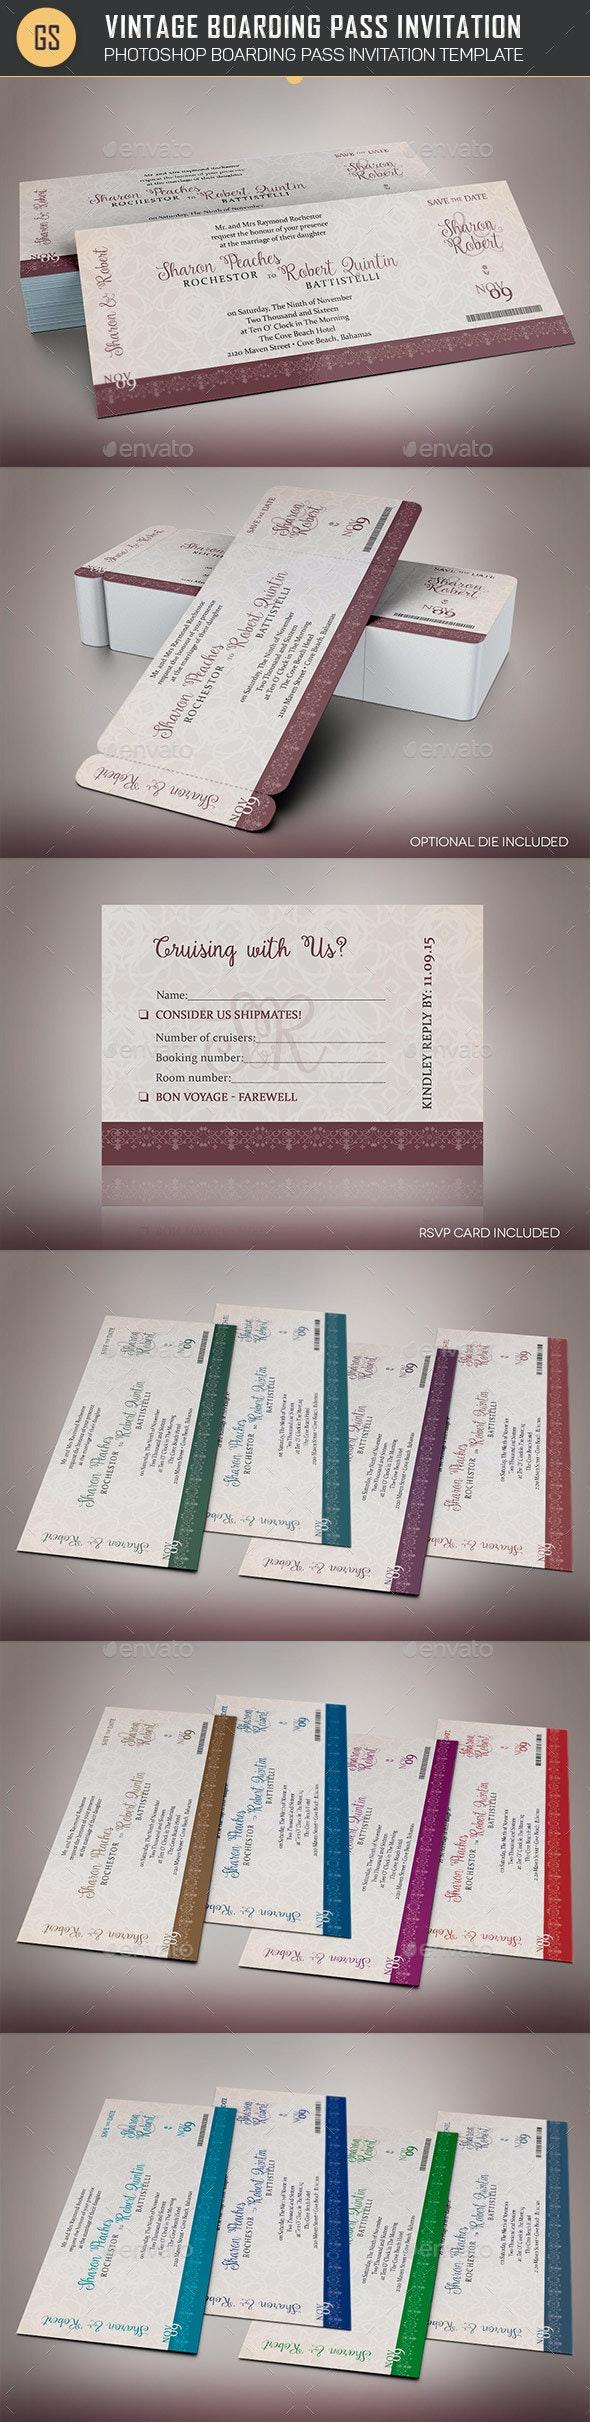 Vintage Boarding Pass Invitation Template - Weddings Cards & Invites